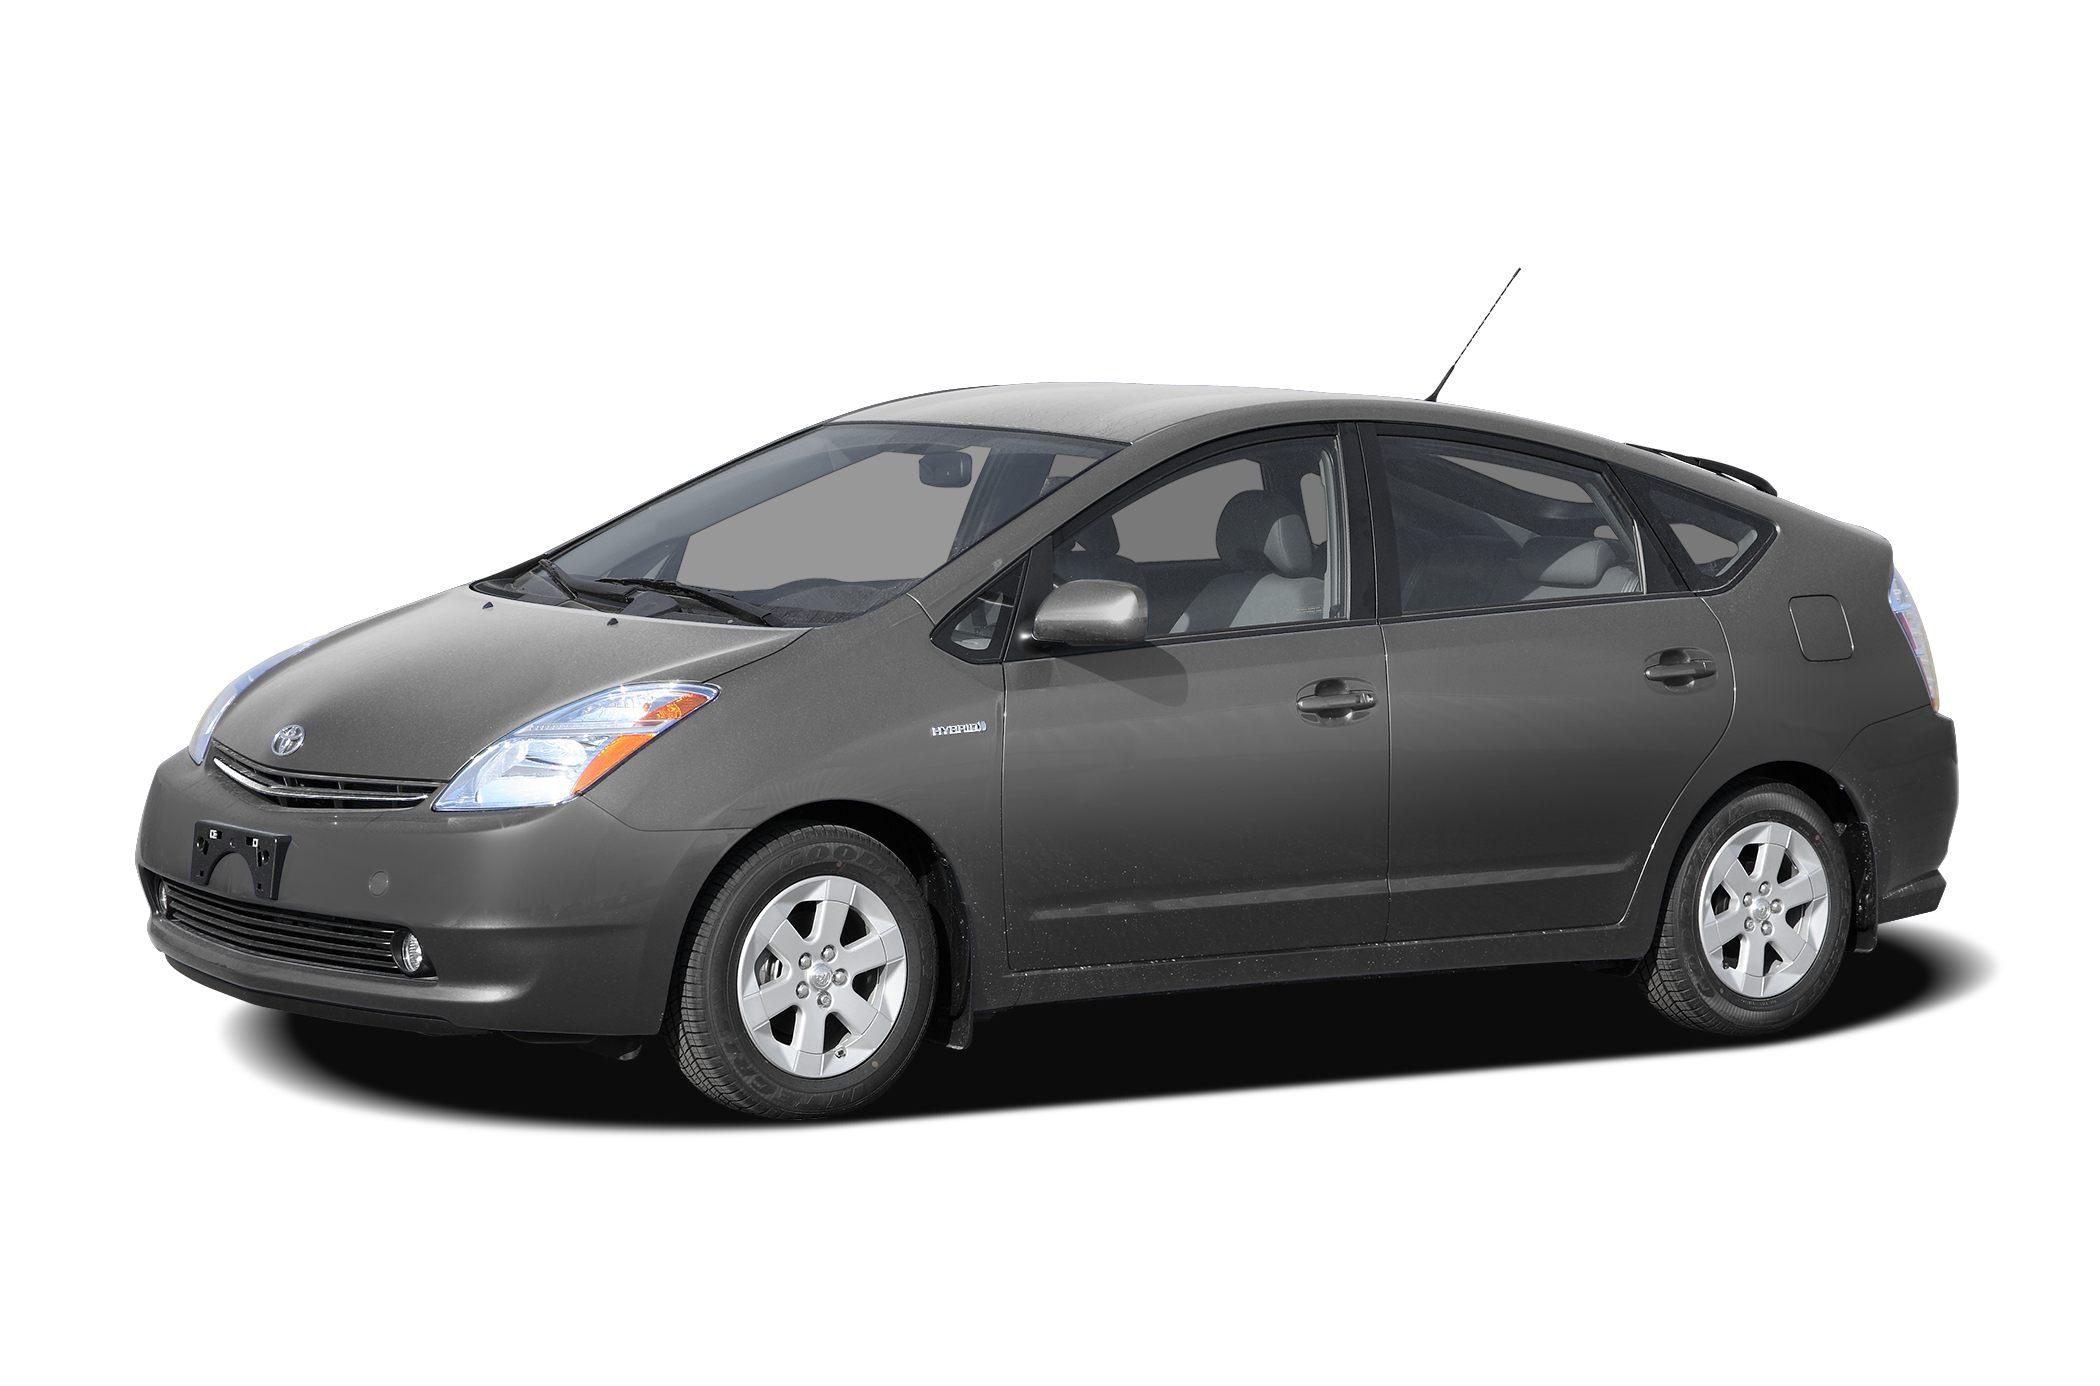 2009 Toyota Prius Crash Test Ratings